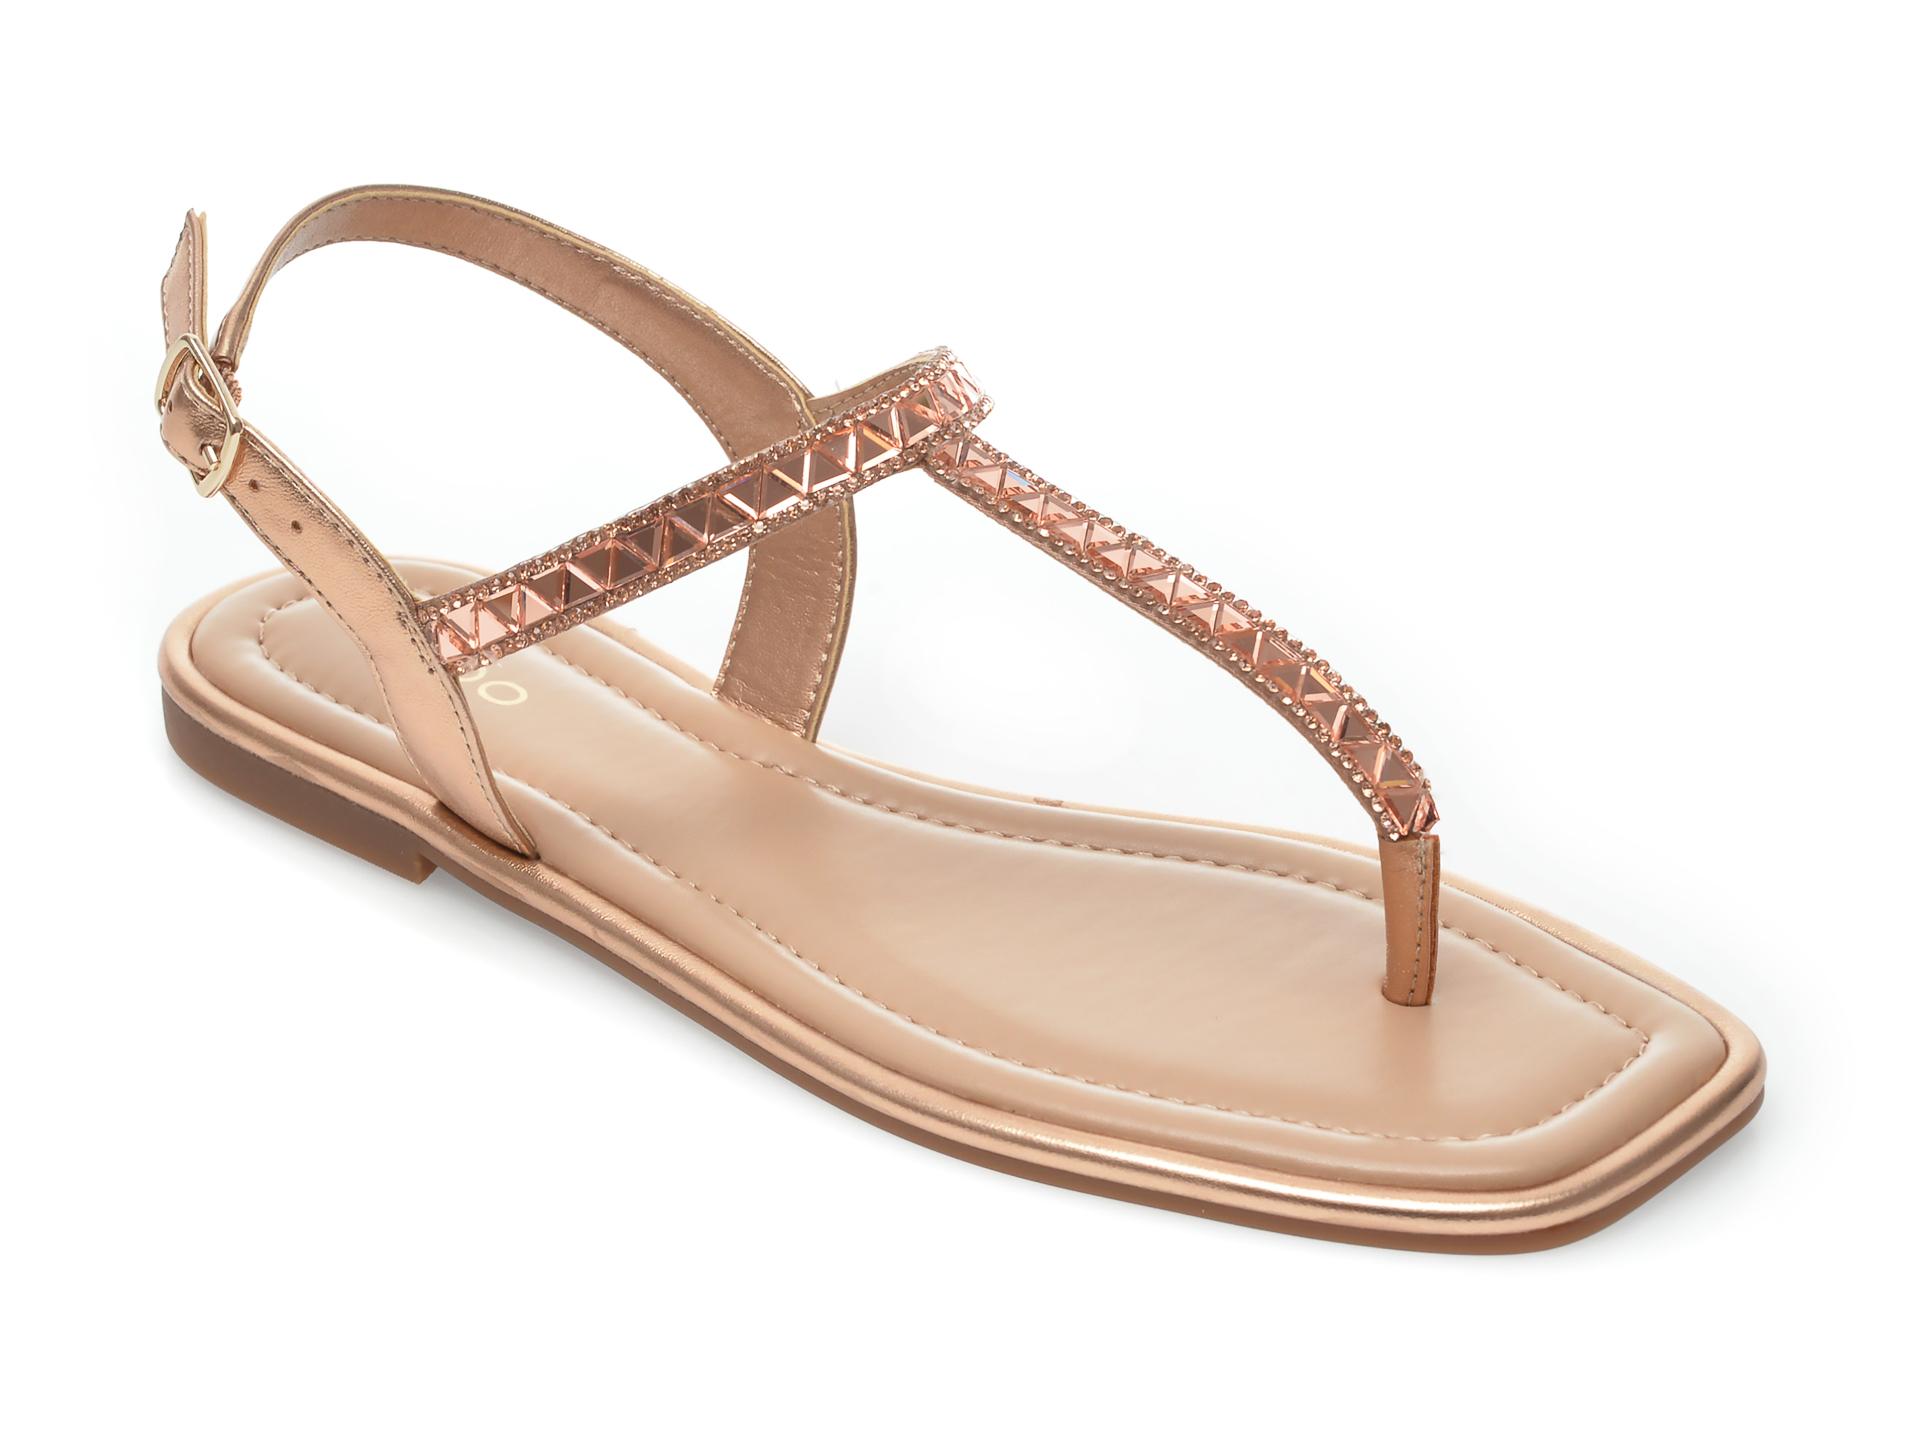 Sandale ALDO roz, Sheina653, din piele ecologica imagine otter.ro 2021